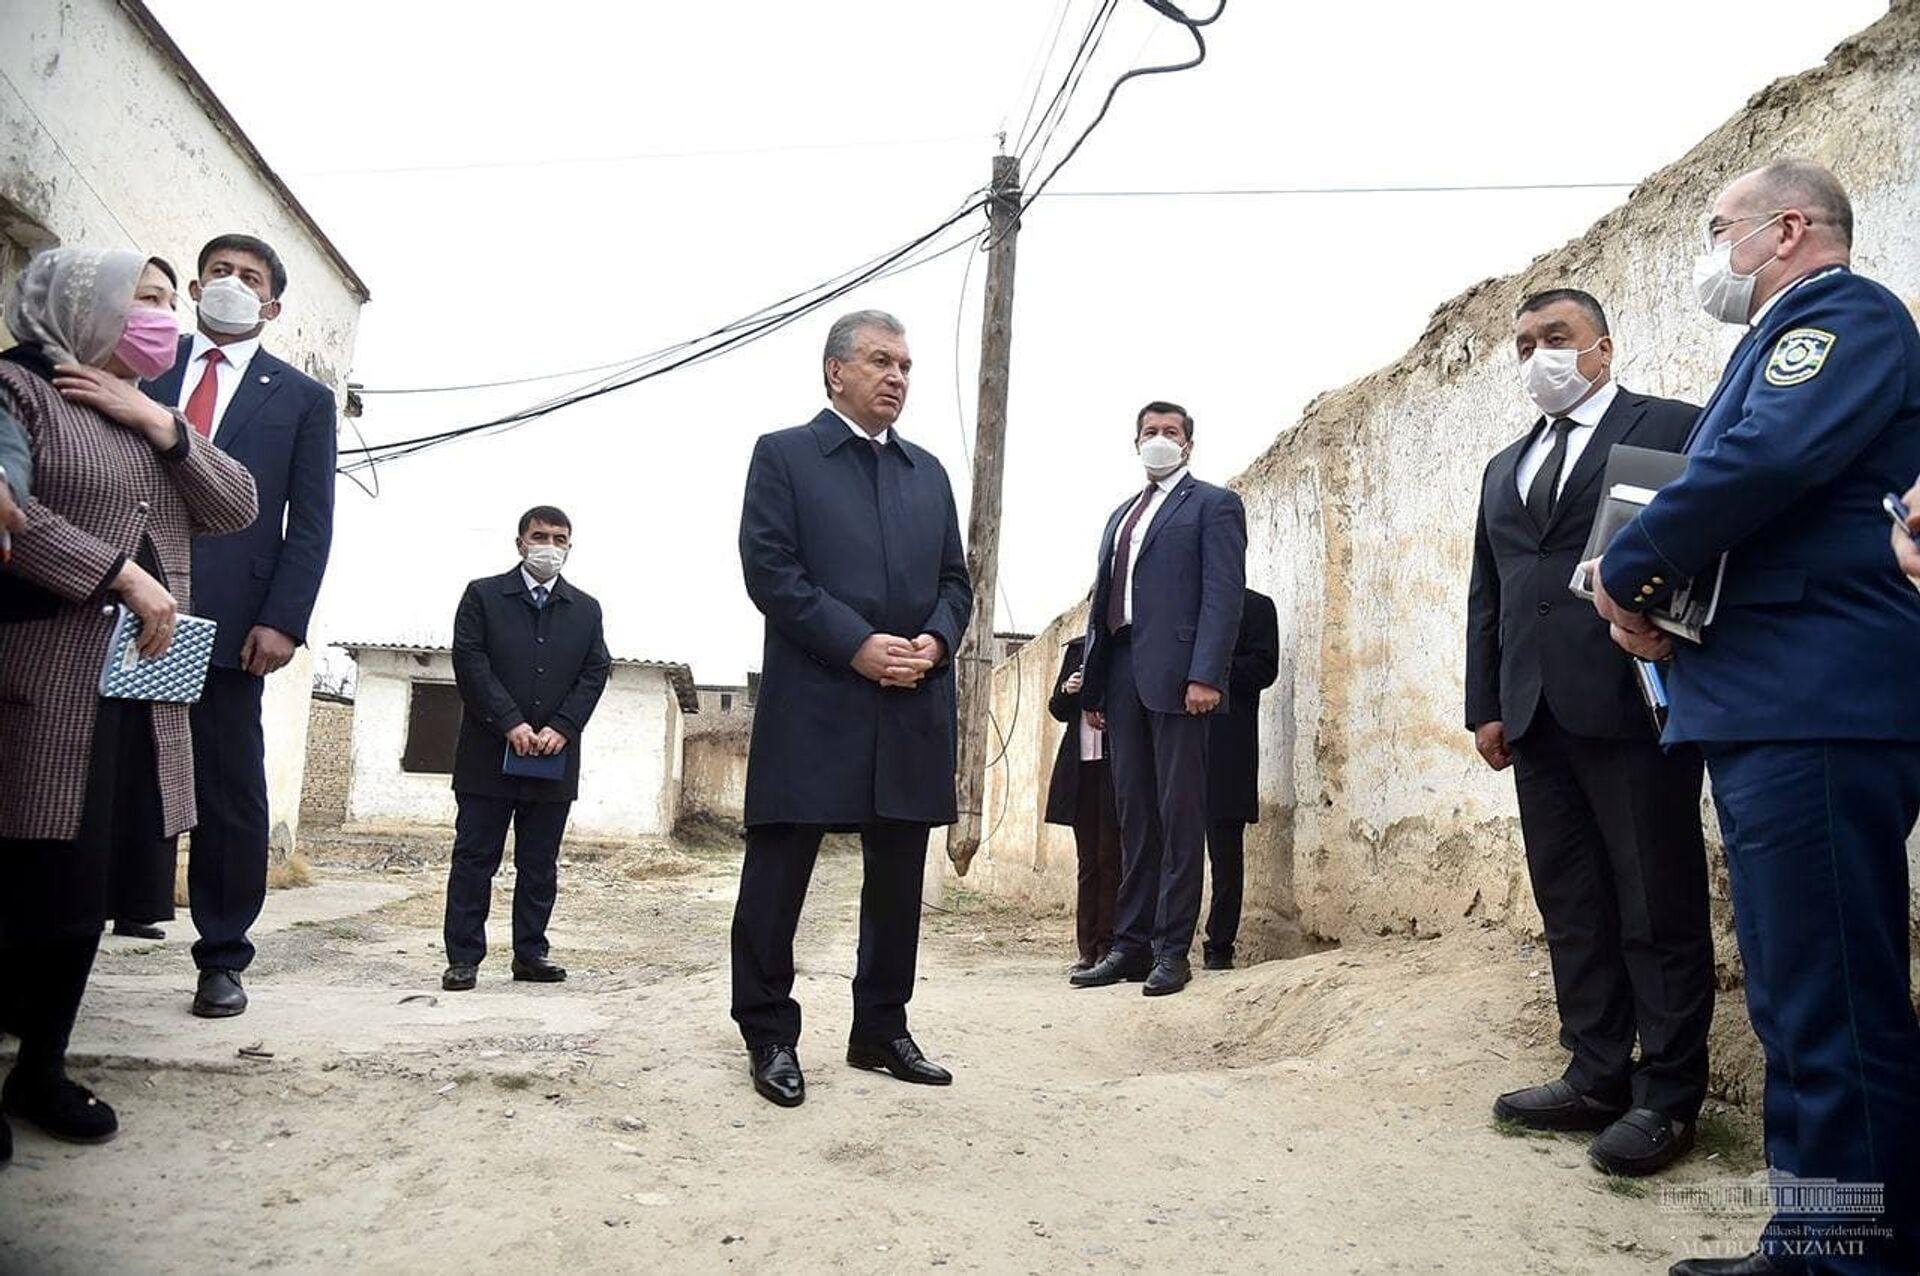 Шавкат Мирзиёев 19 февраля посетил махаллю Бунёдкор в Намангане - Sputnik Узбекистан, 1920, 09.03.2021